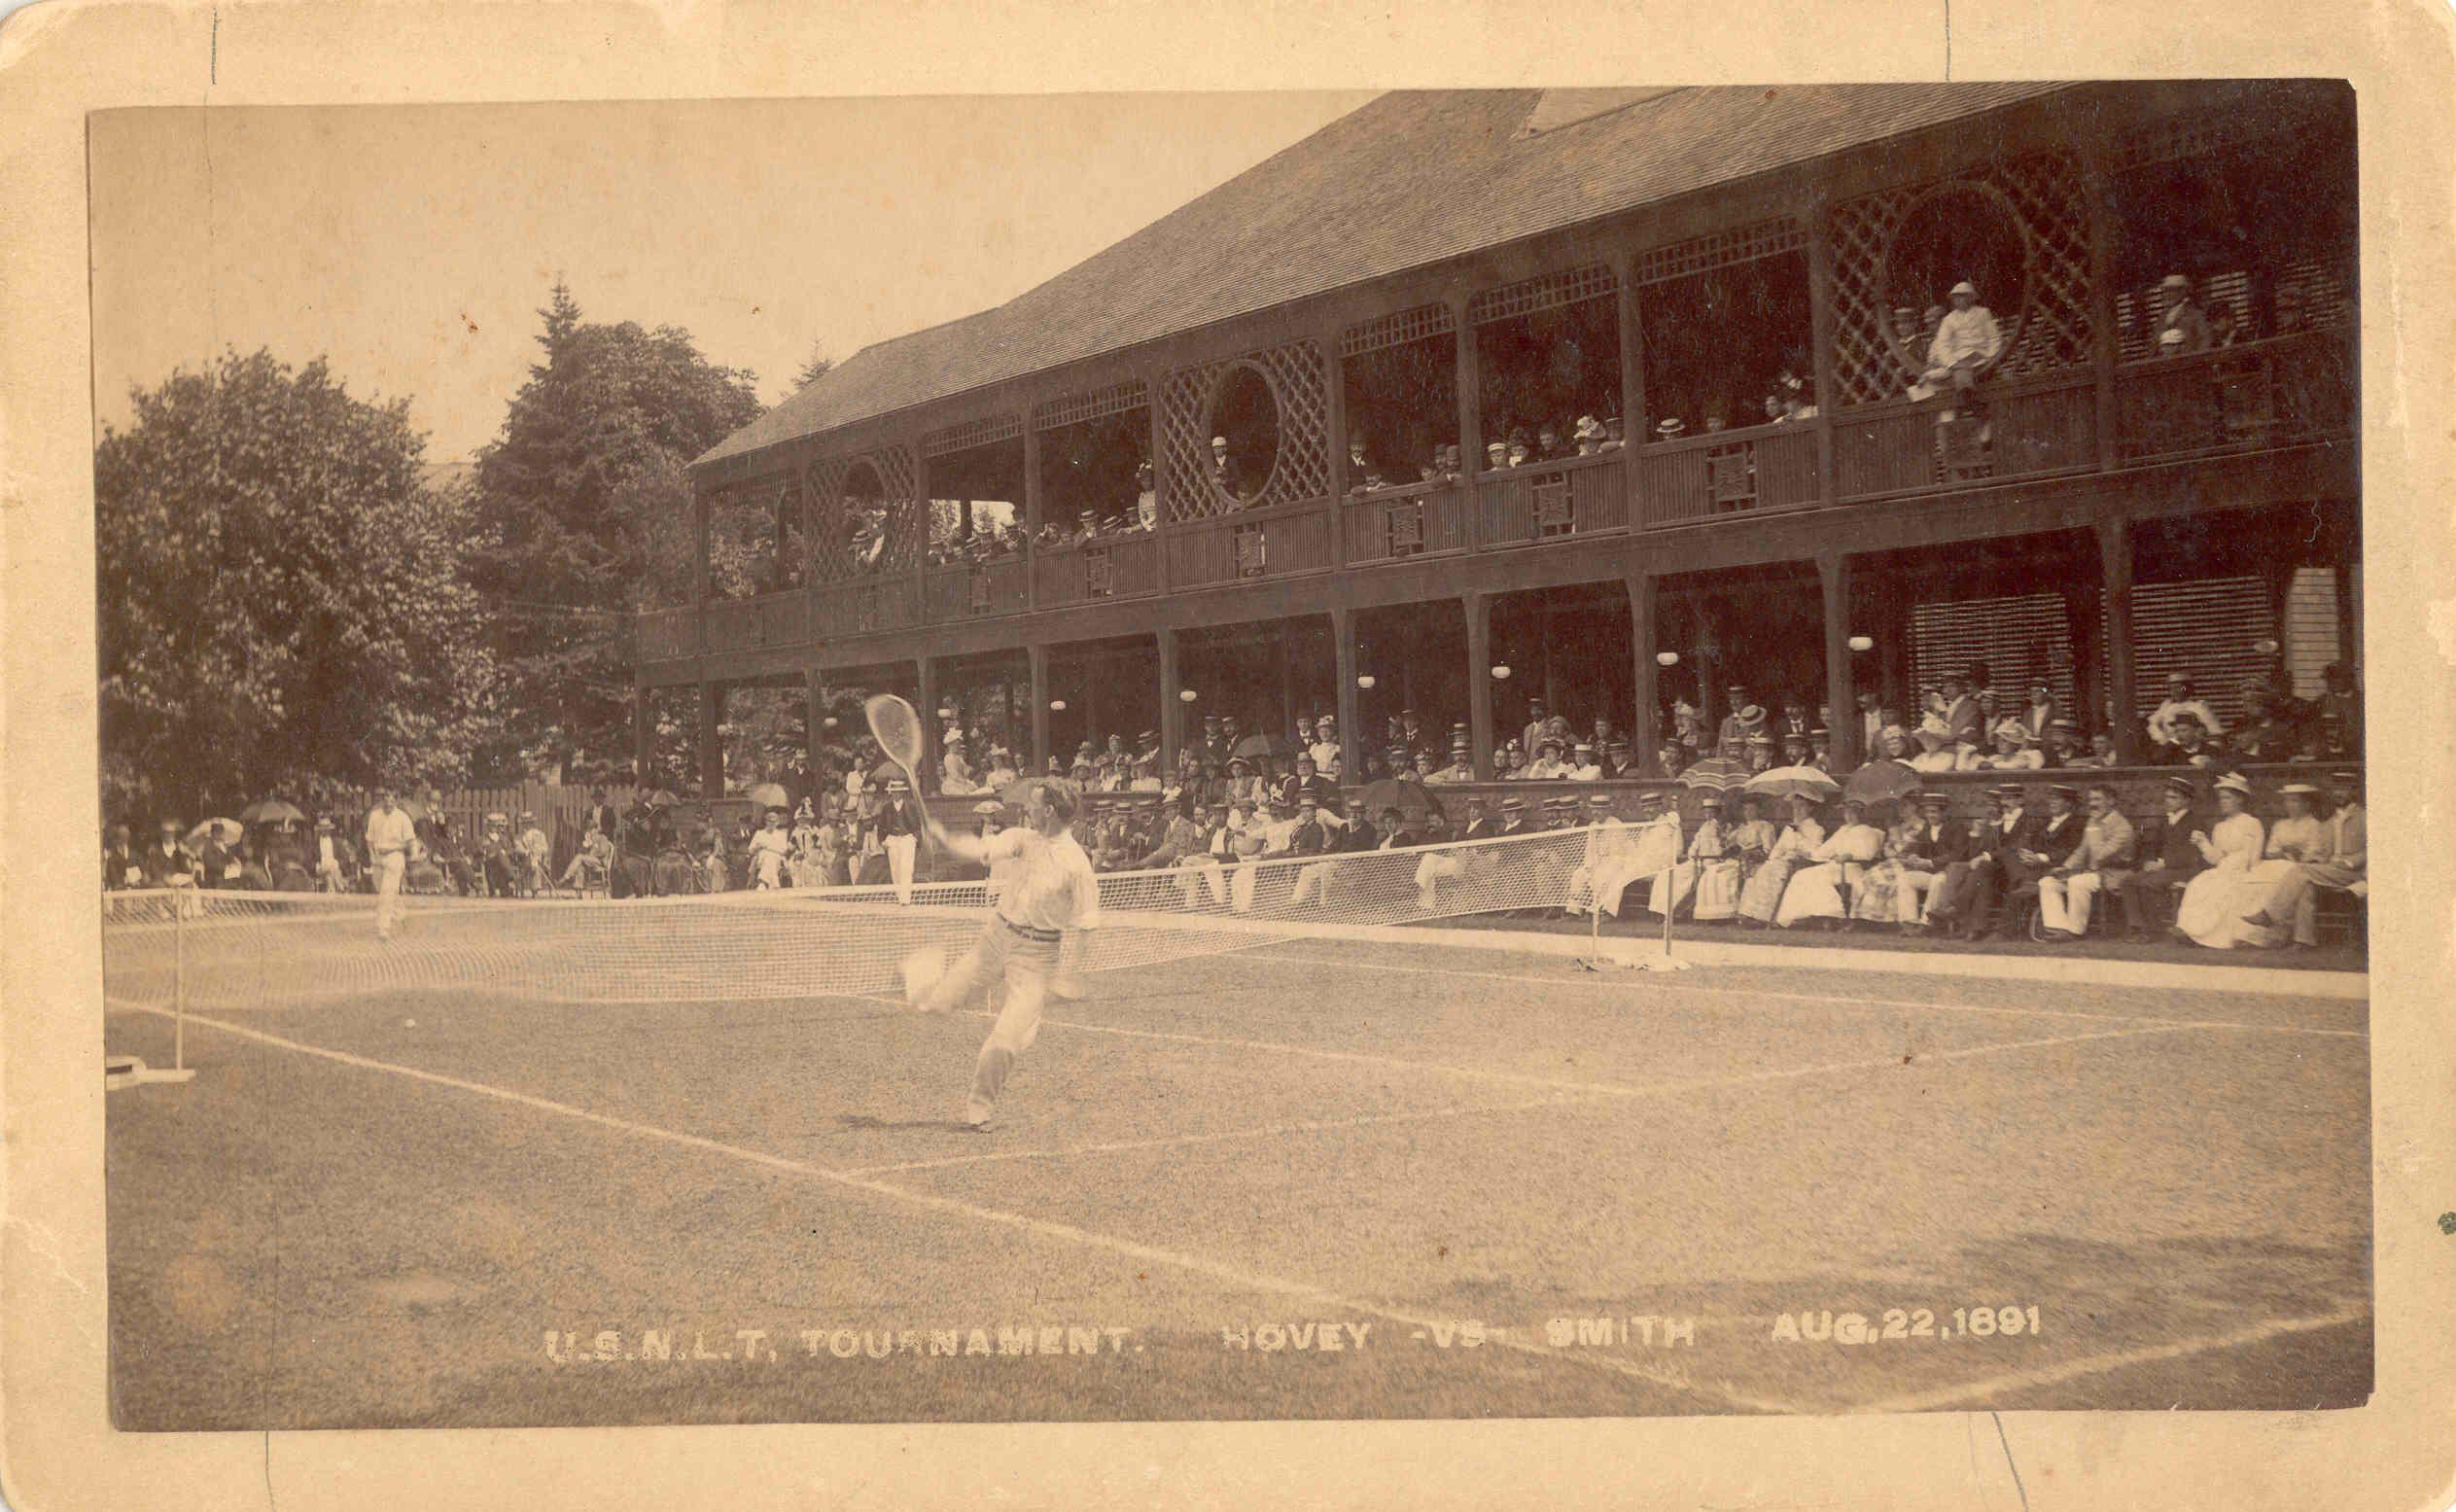 History Of Tennis In Newport International Tennis Hall Of Fame Rhode Island History Newport Tennis